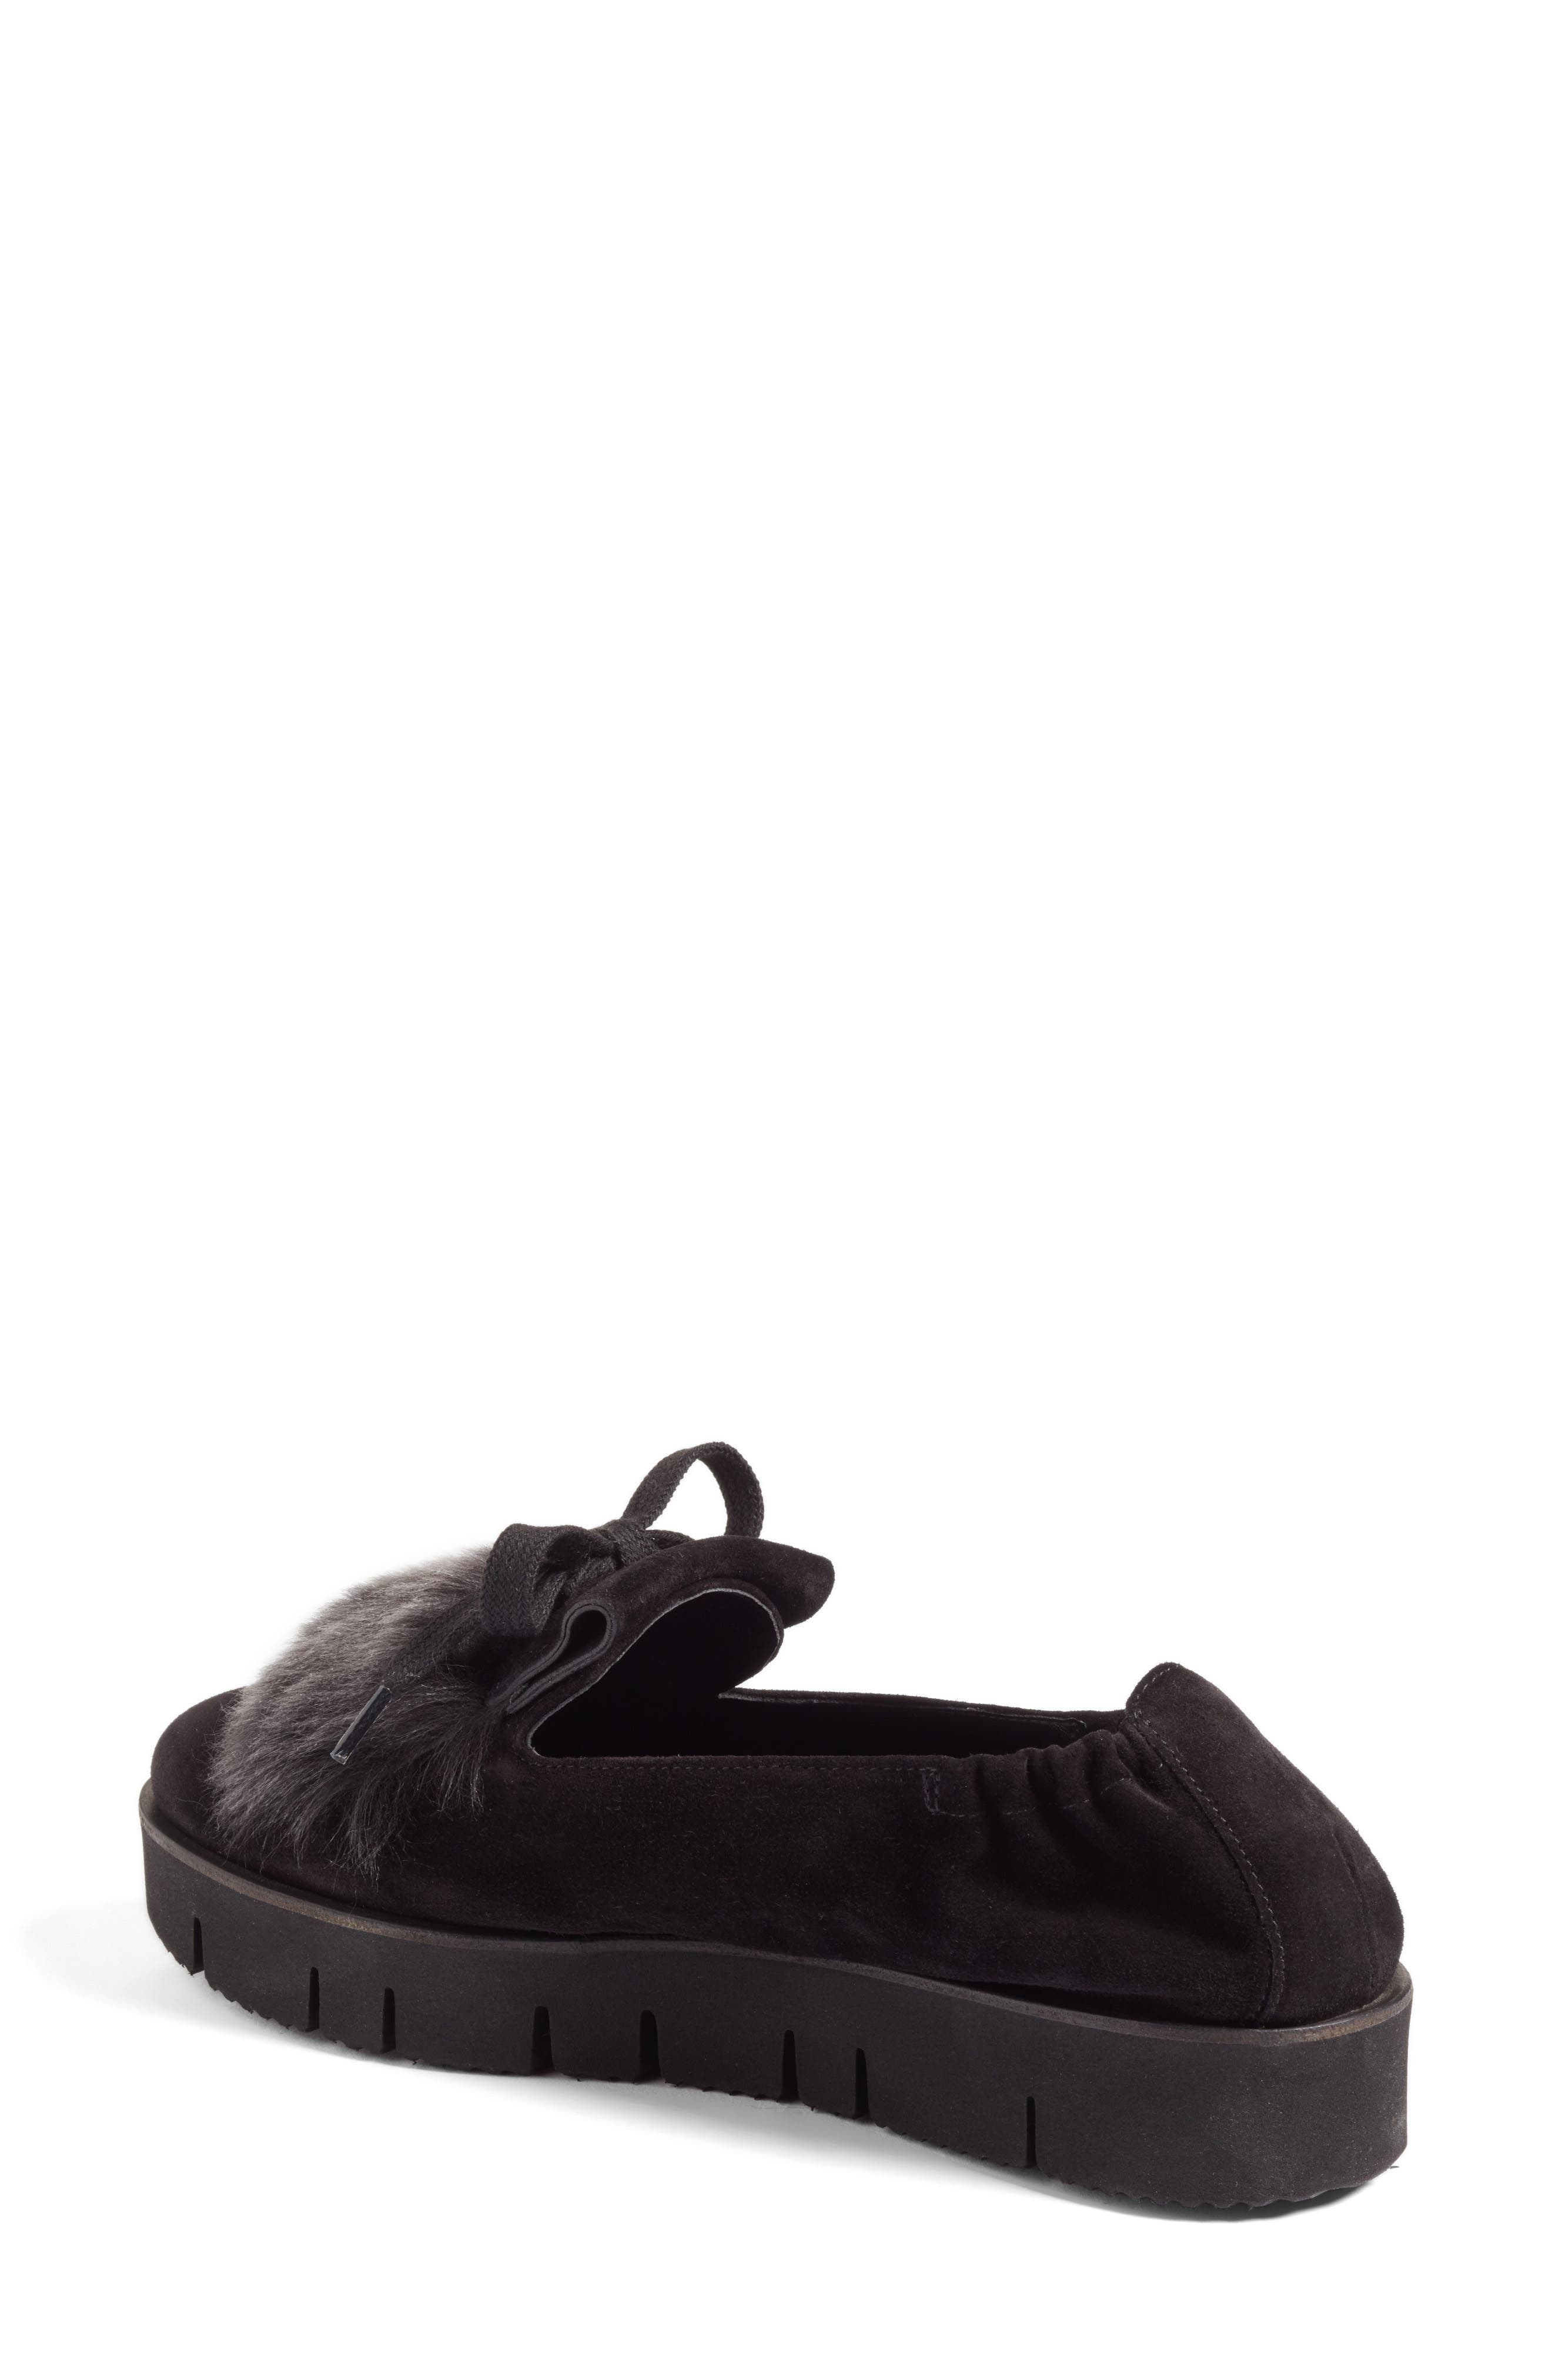 Kennel & Schmenger Malu Suede & Genuine Shearling Slip-On Sneaker,                             Alternate thumbnail 2, color,                             001